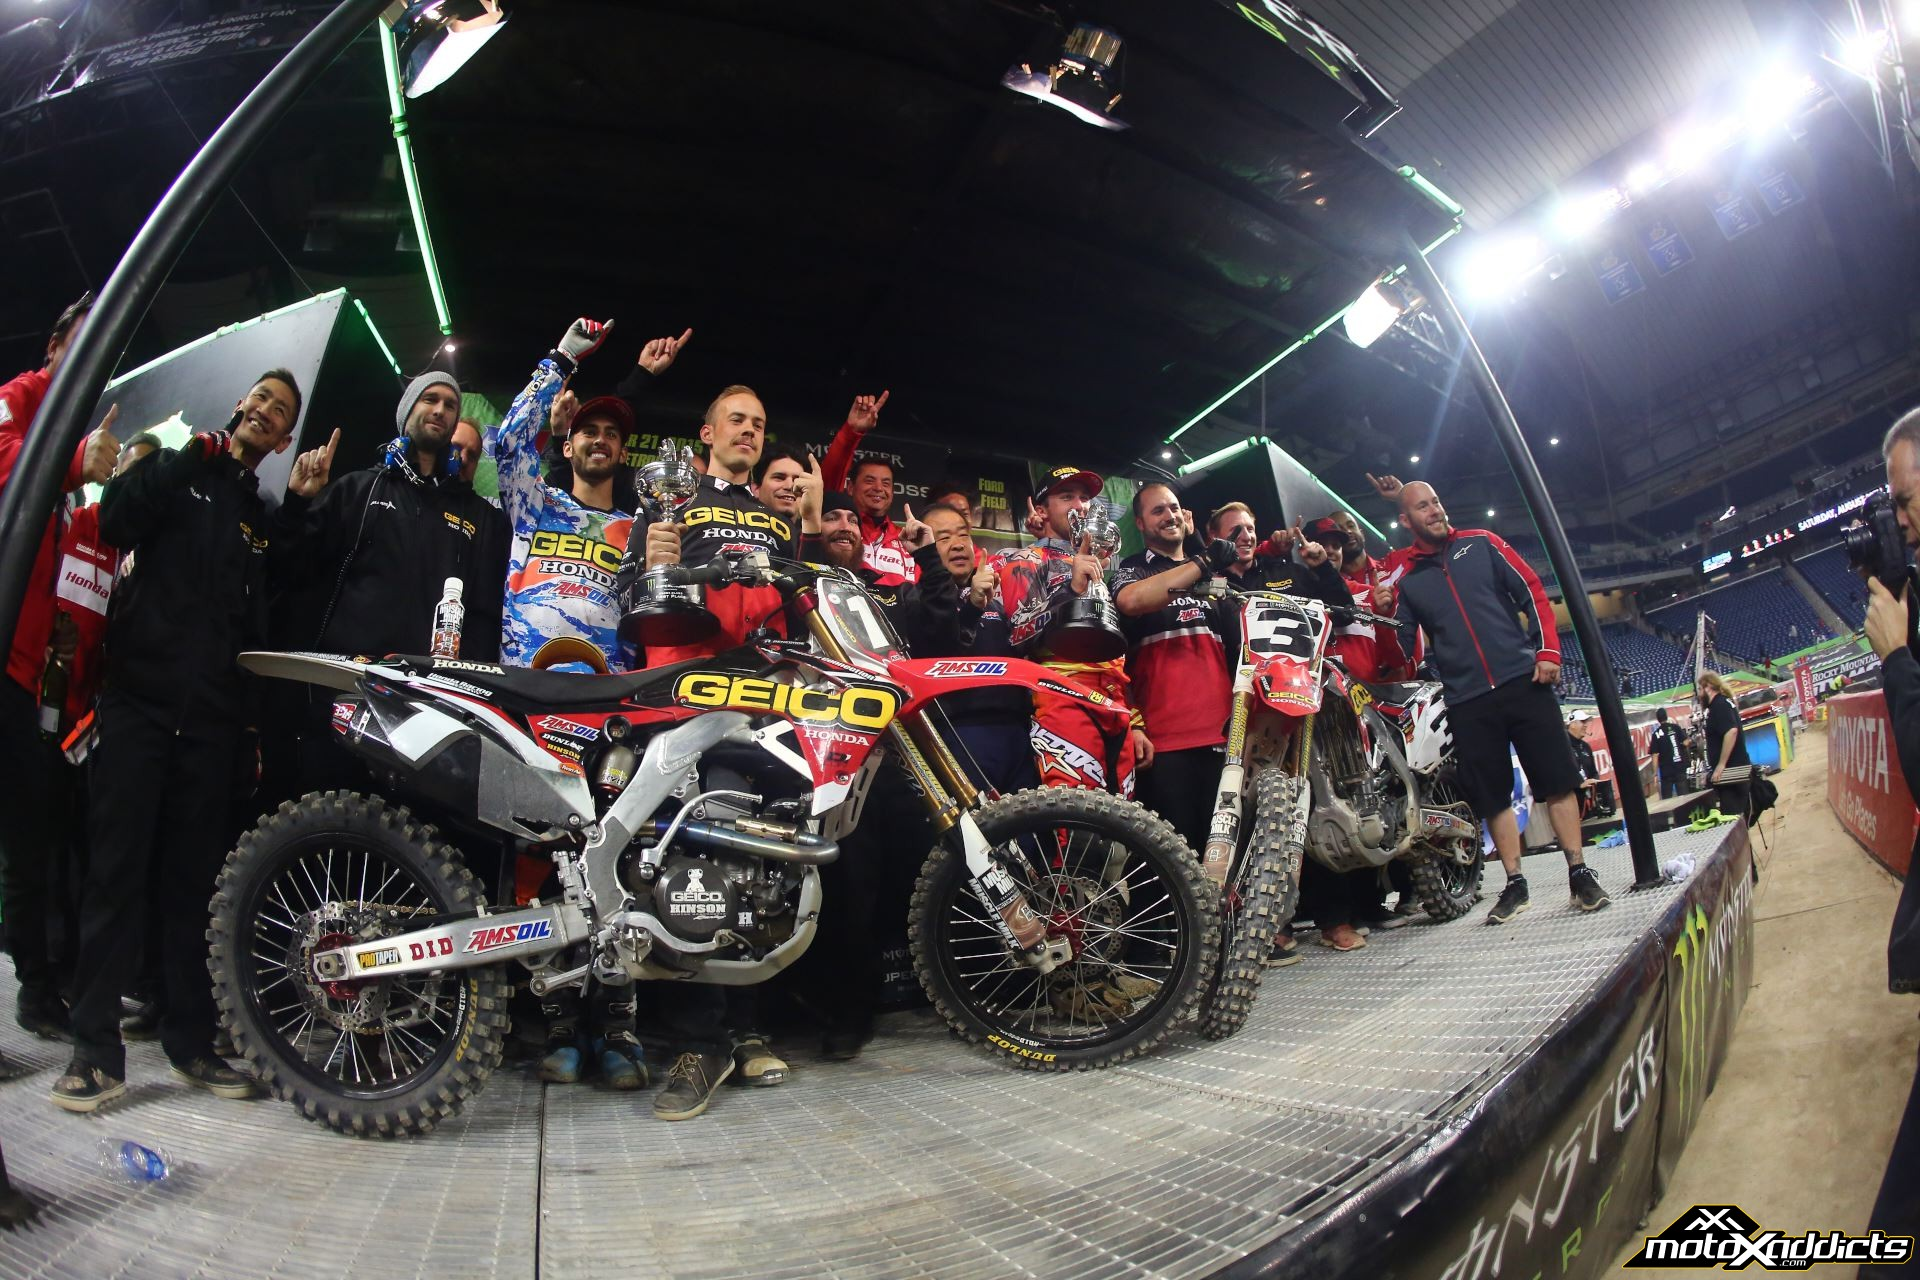 Motoxaddicts Photo Fix 2015 Detroit Supercross Gallery